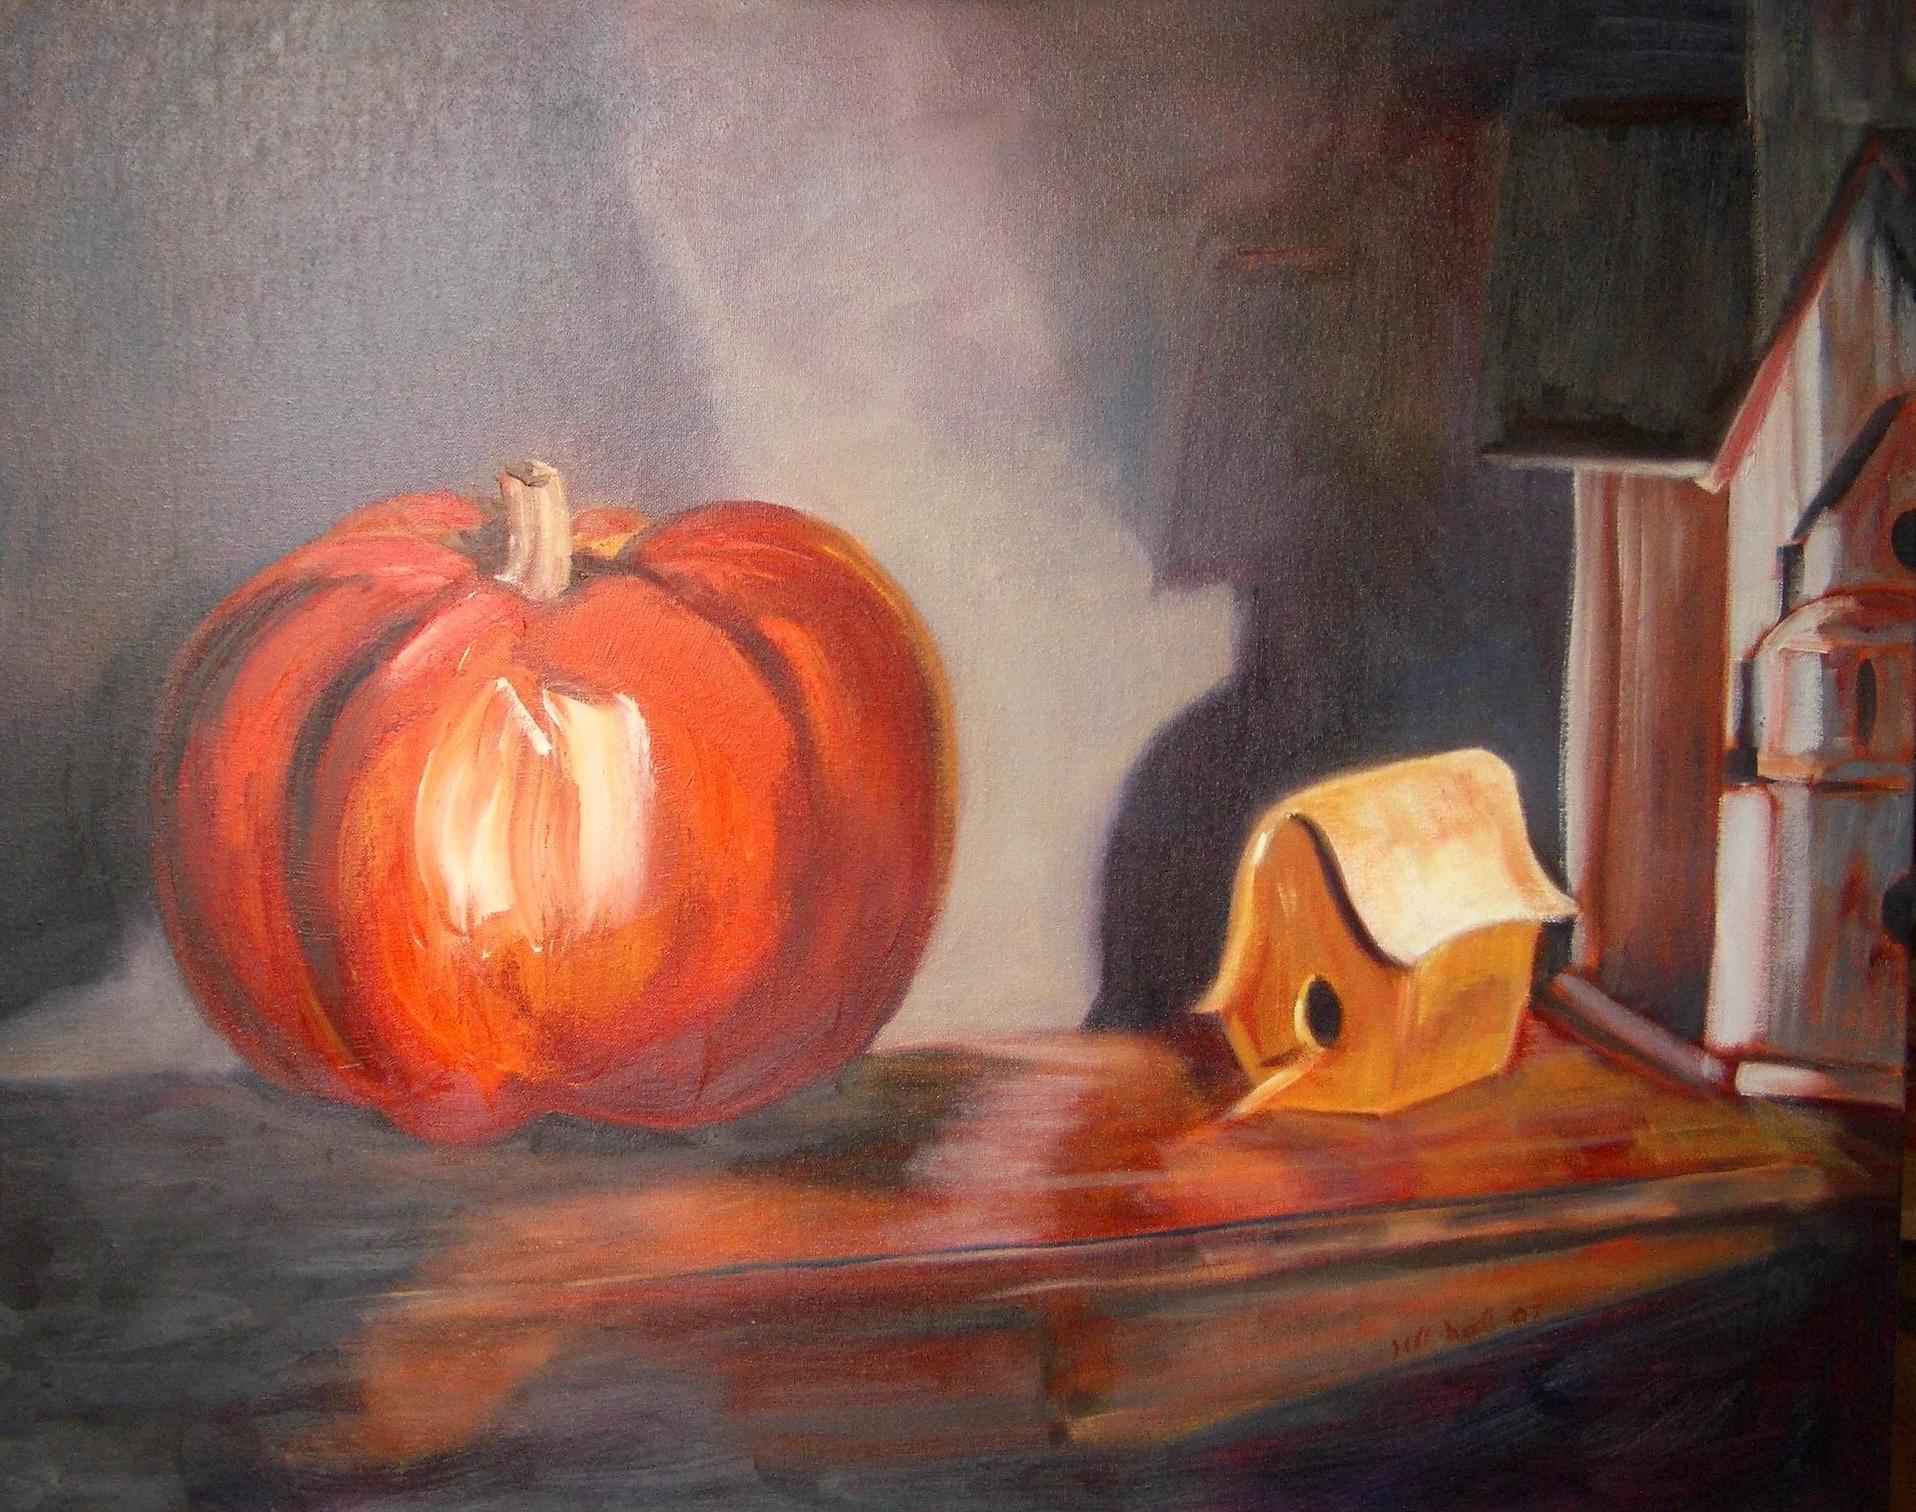 Pumpkin and Birdhouse - 24x30